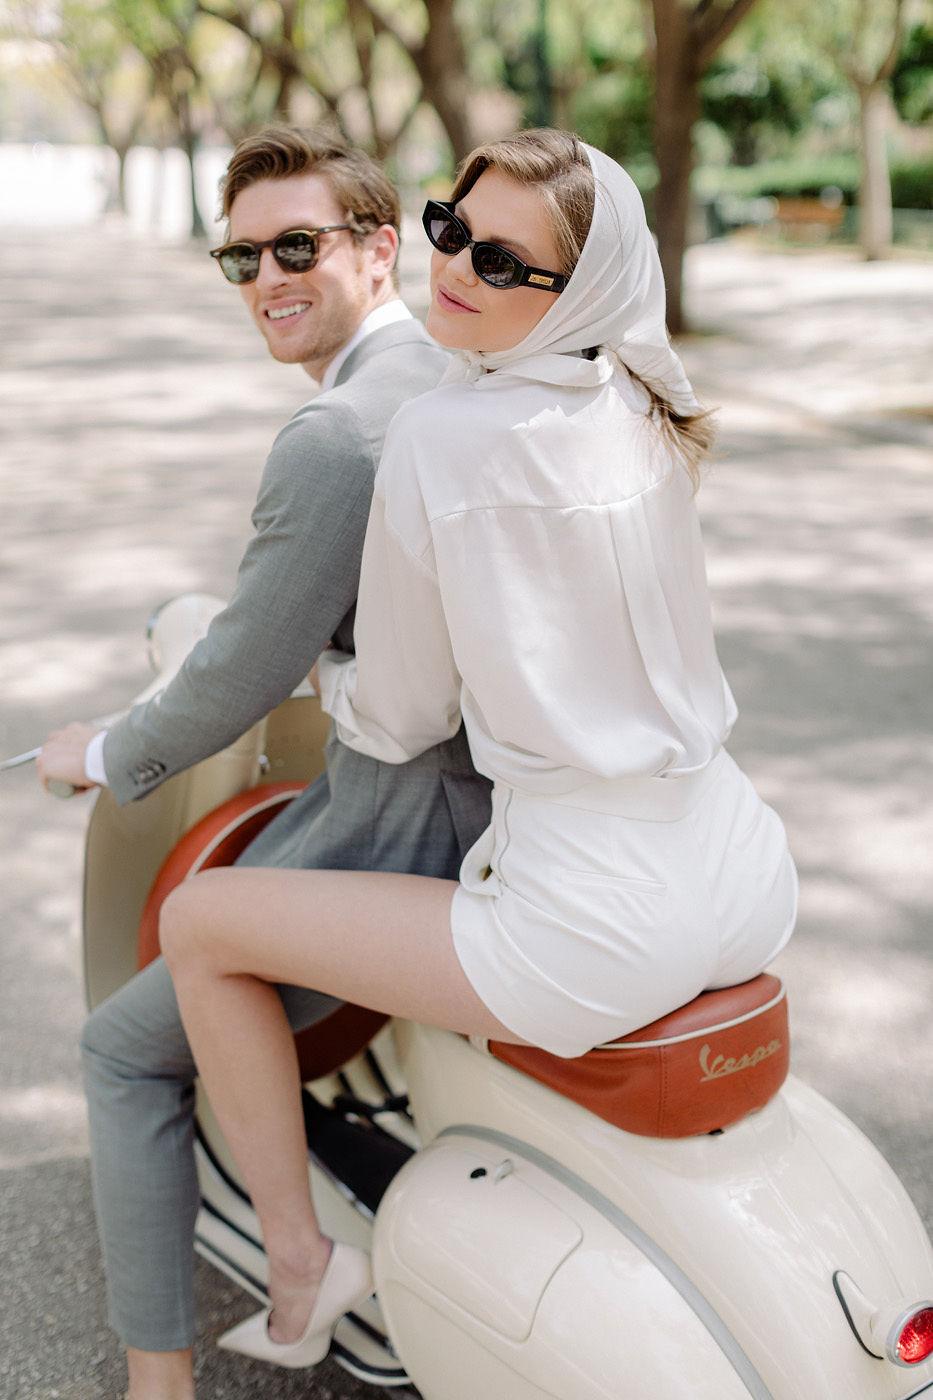 Wedding Proposal In Athens - Stylish Couple